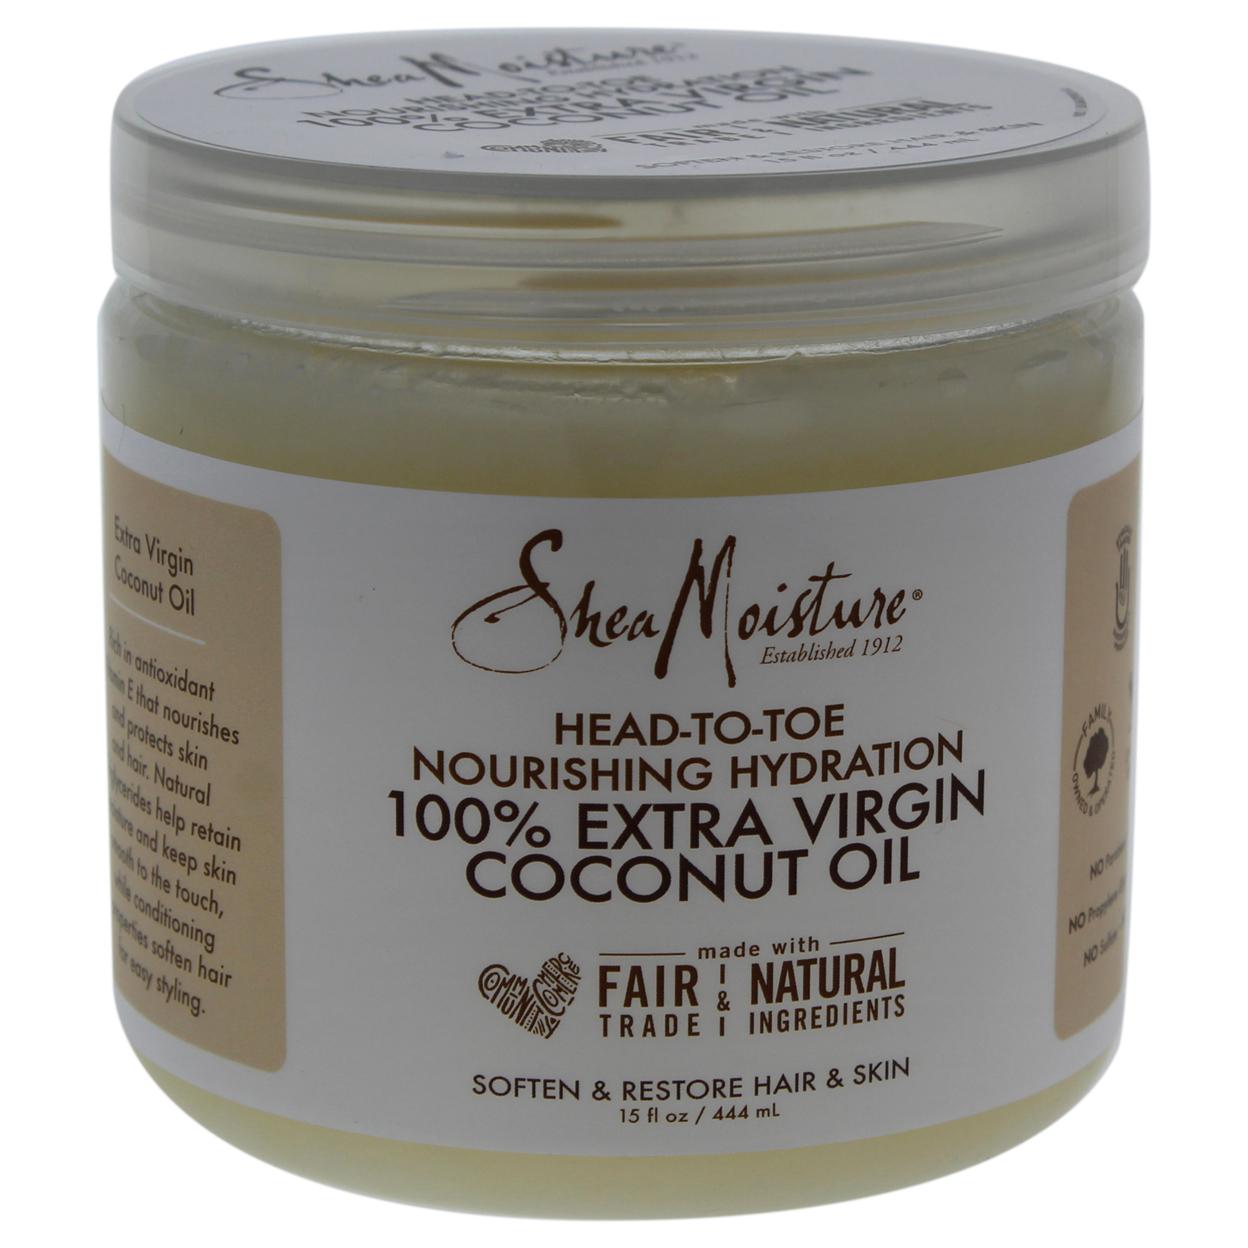 100% Extra Virgin Coconut Oil Head To Toe Nourishing Hydration By Shea Moisture For Unisex 15 Oz Oil